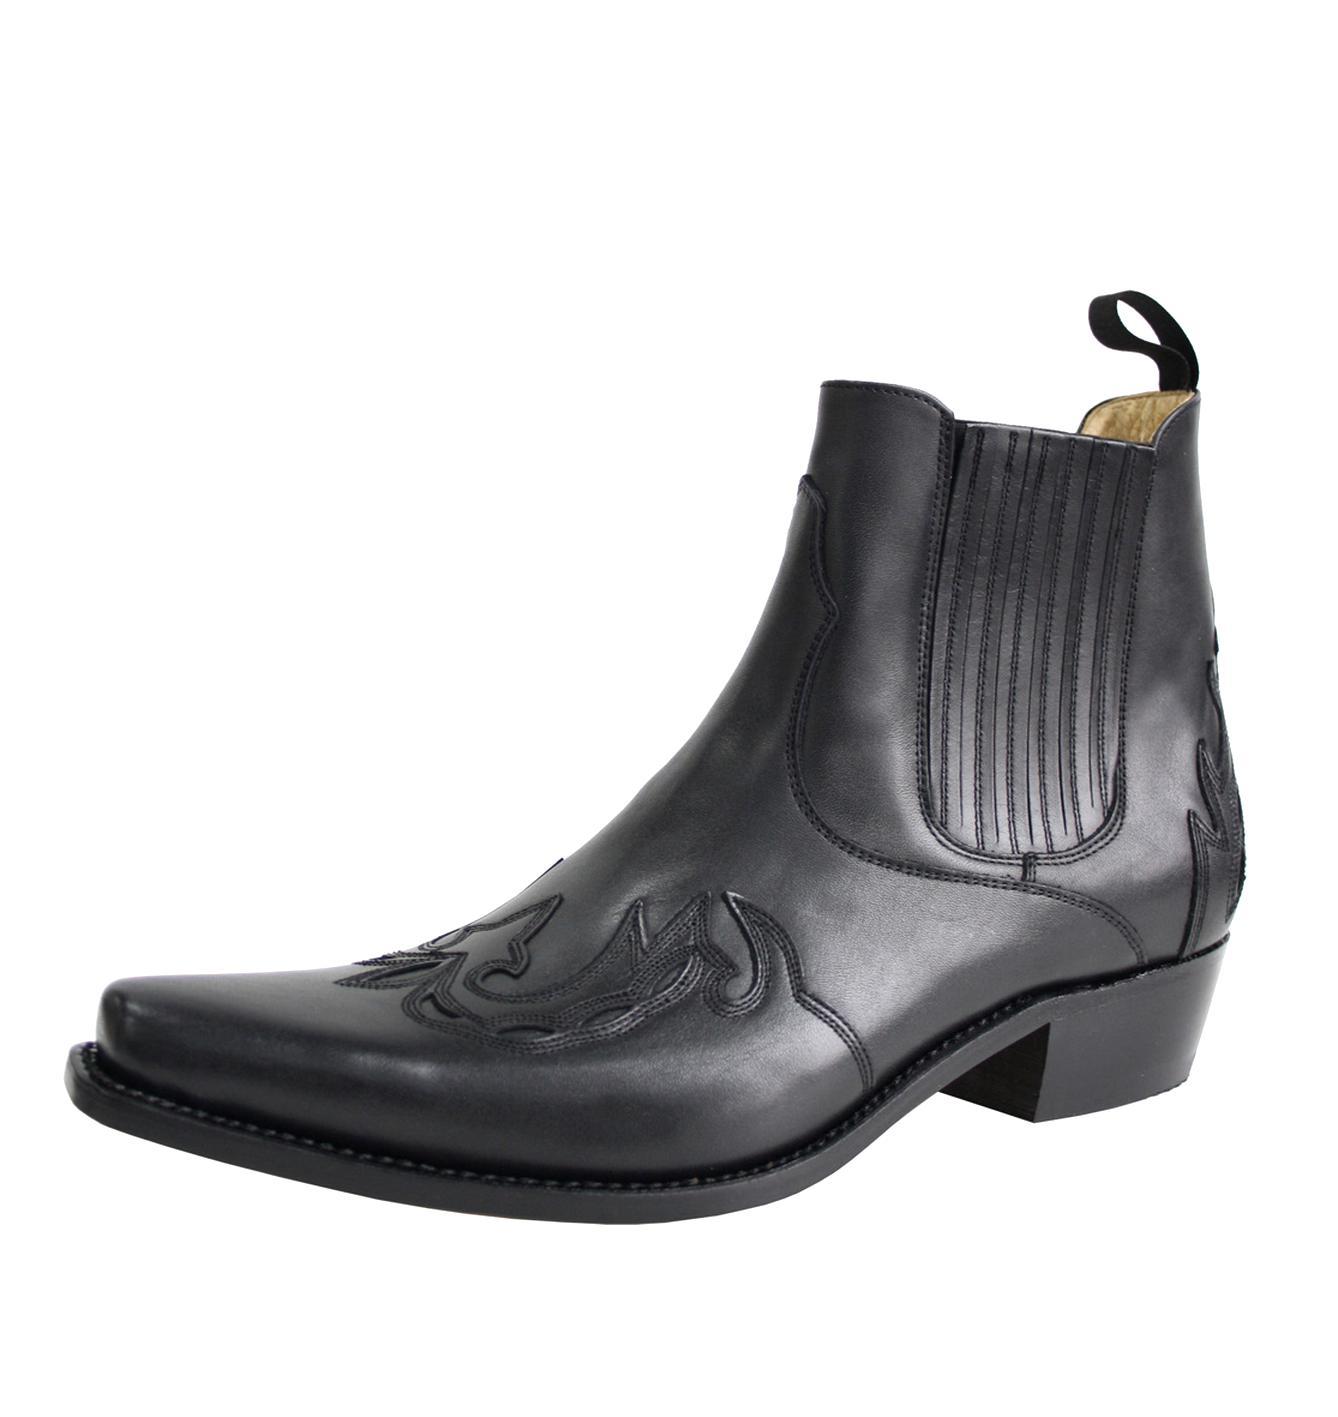 chaussure santiag homme d'occasion